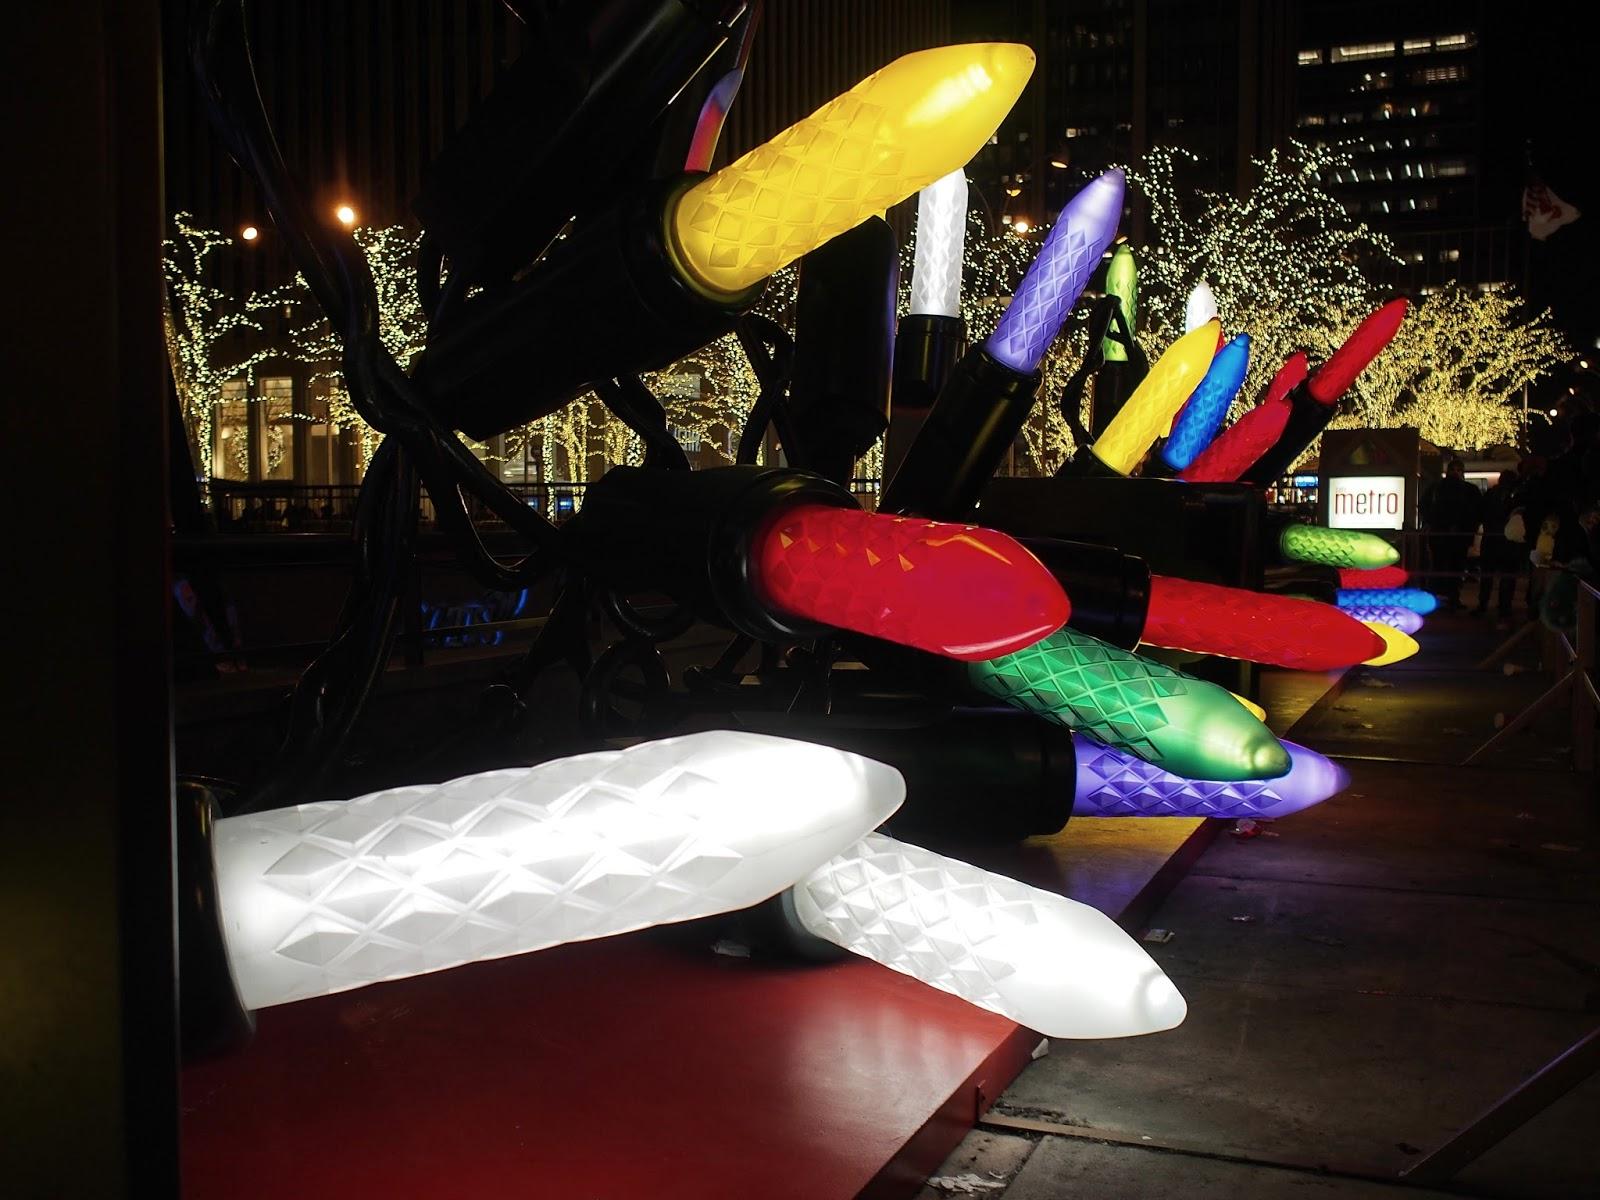 Lights #lights  #holidays #besttimeoftheyear #nyc ©2014 Nancy Lundebjerg